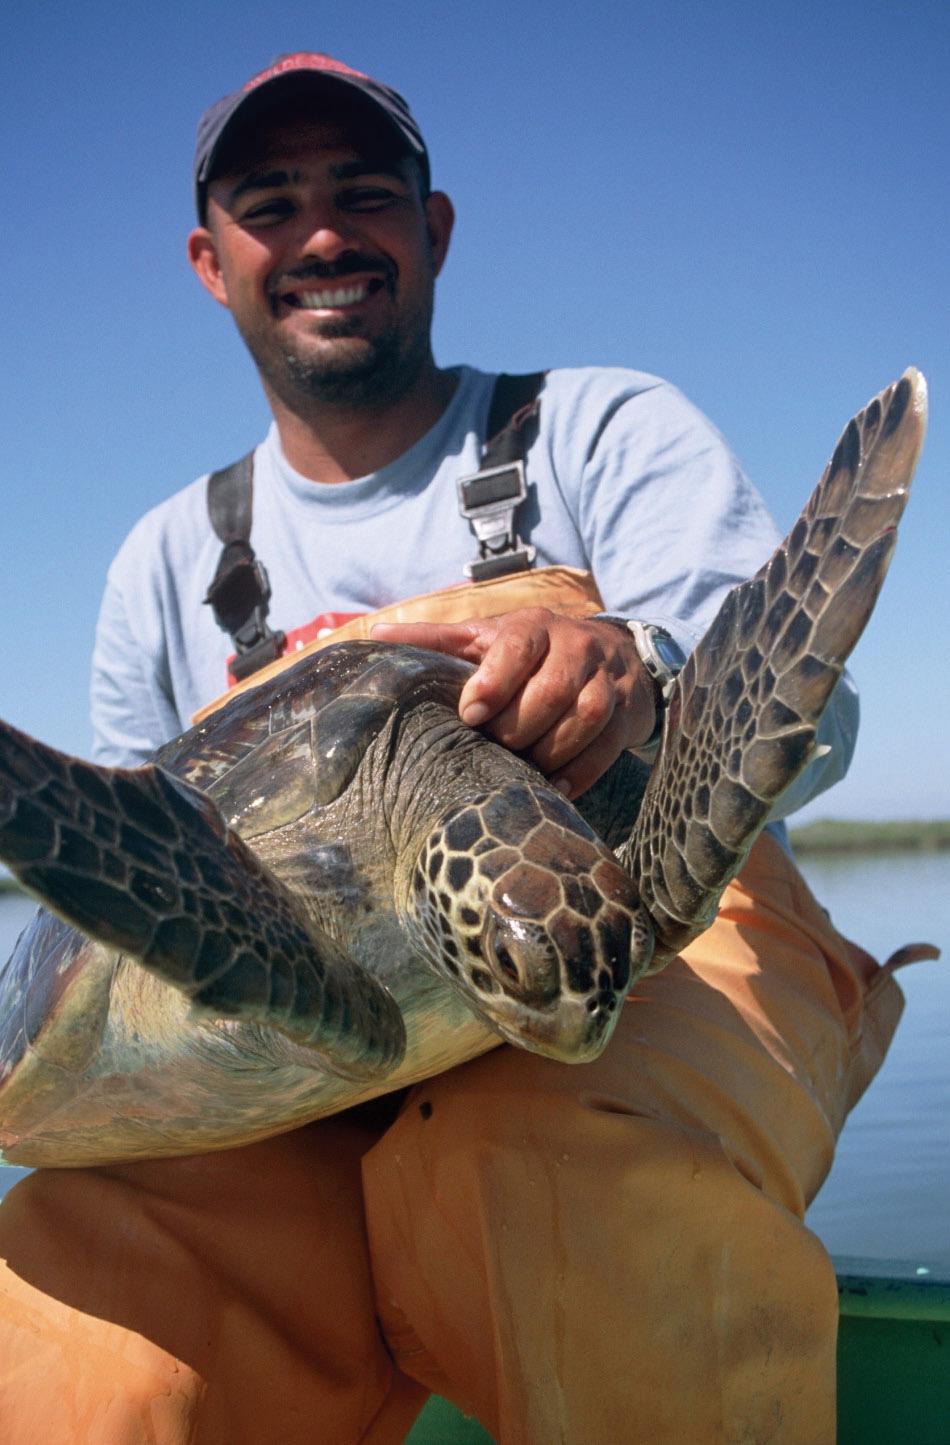 Rodrigo Rangel, Grupo Tortuguero Coordinator, releases a black turtle in Bahia Magdalena, Baja California Sur, in March 2003. © W. J. NICHOLS